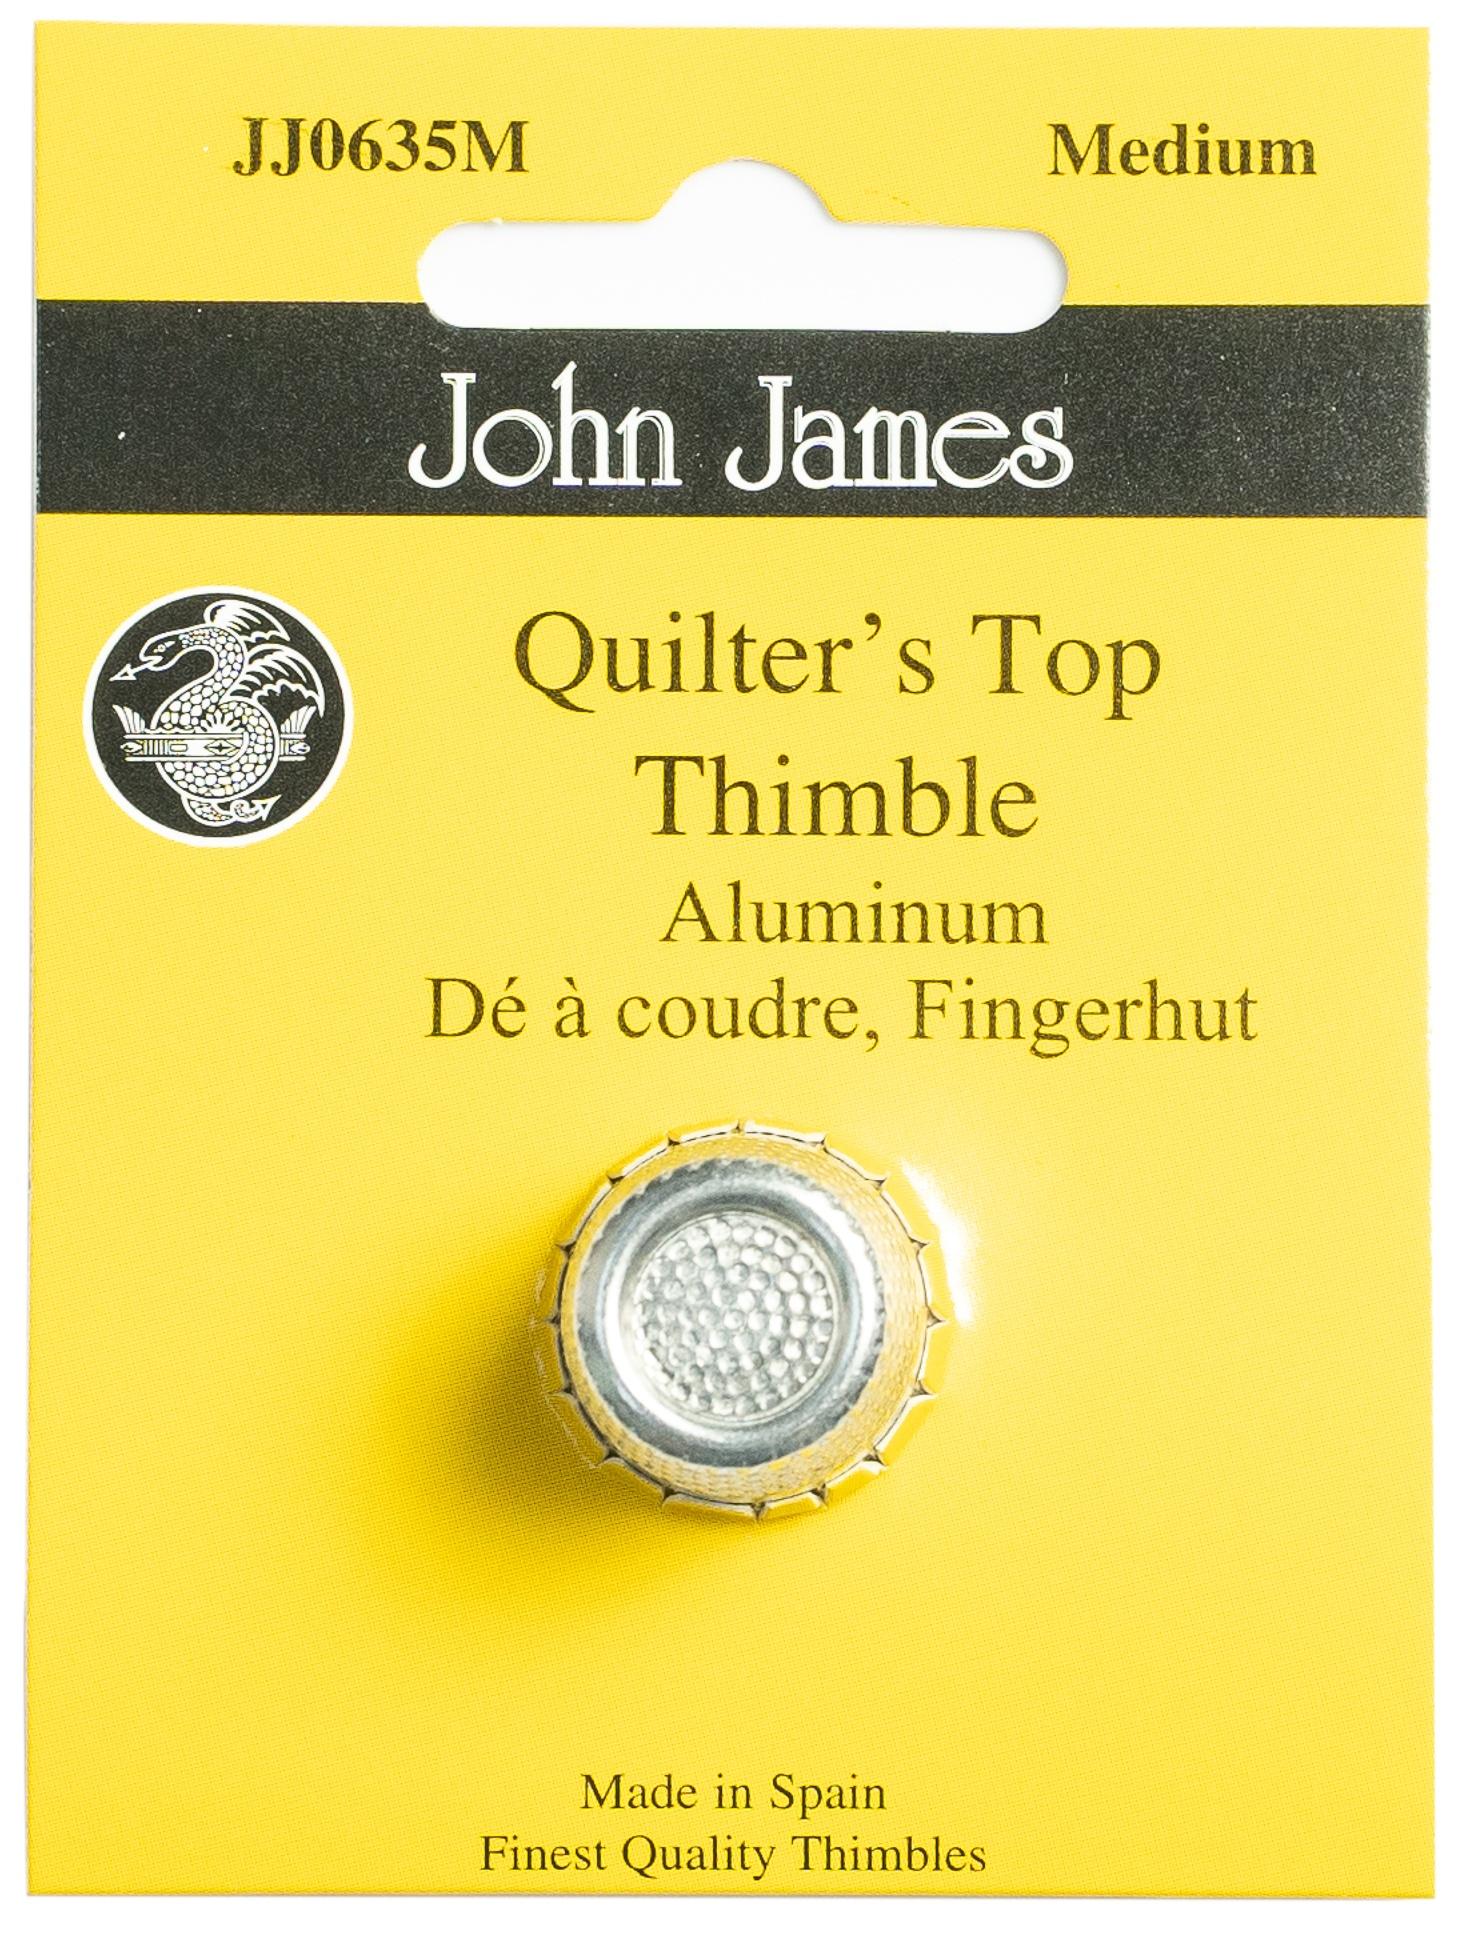 John-James-Nickel-Plated-Steel-Crimp-Top-Thimble-Medium-Size-7-JJ0635-M